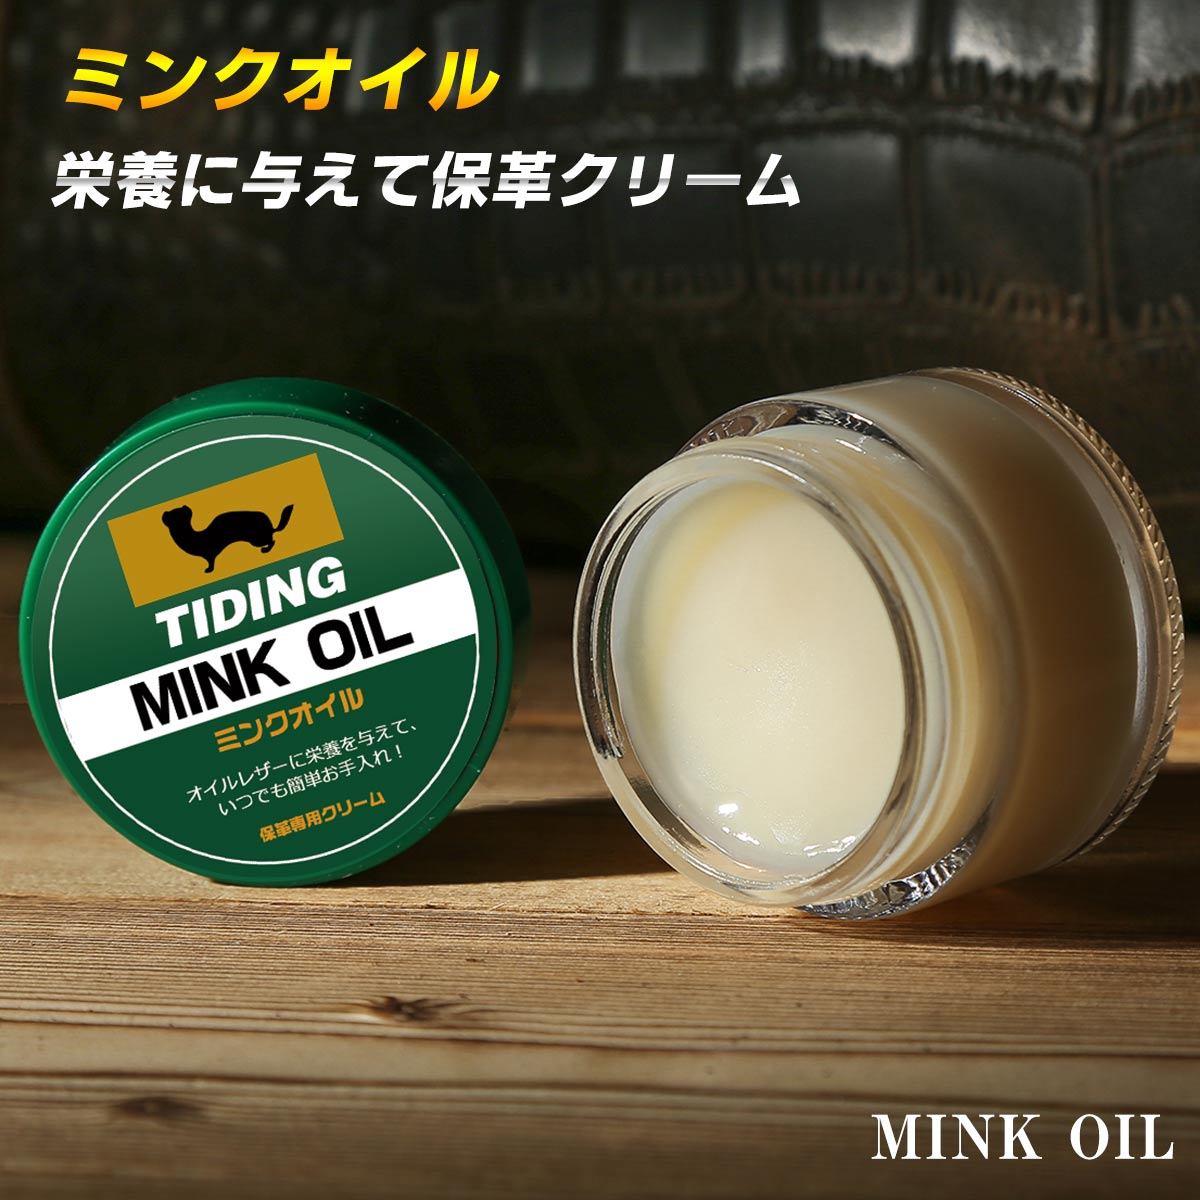 TIDING ミンクオイル MINK OIL レザーケア 保革クリーム 防水 保革剤